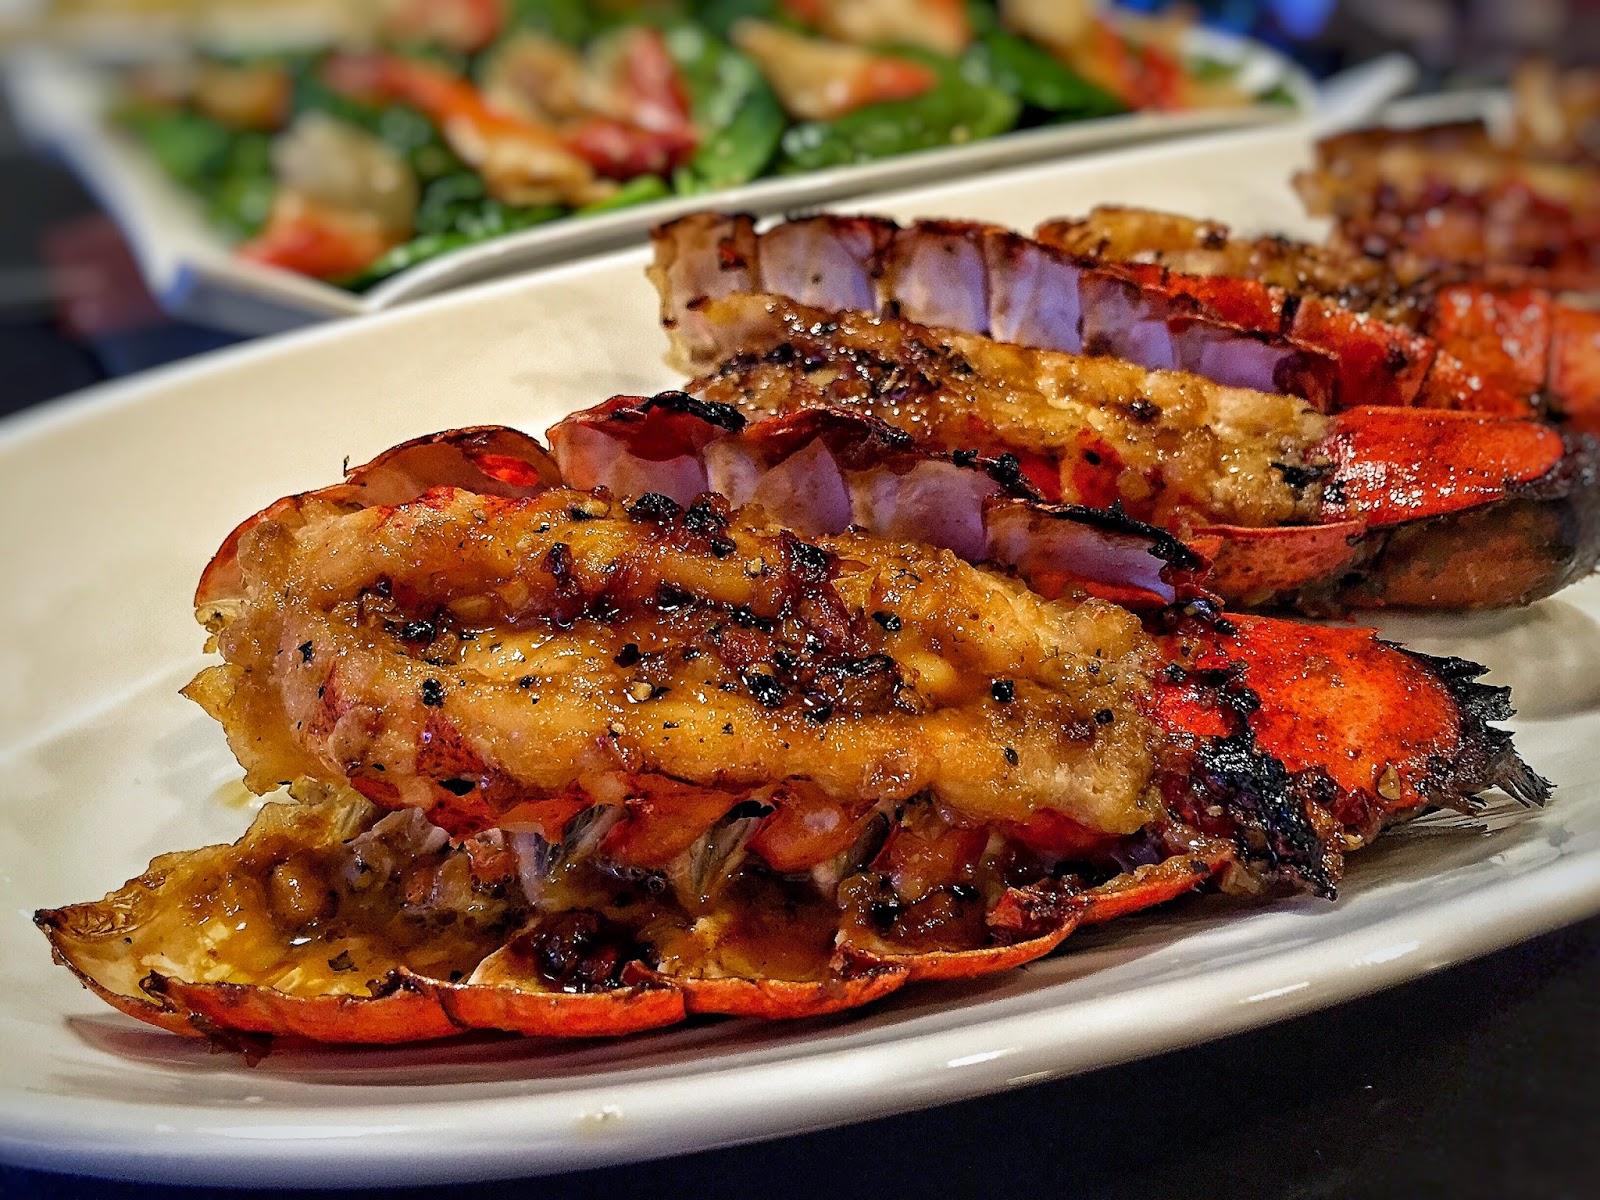 The Spices Of Life . . .: Tôm Hùm Nướng Bơ Tỏi-Roasted Garlic Butter Lobster Tails